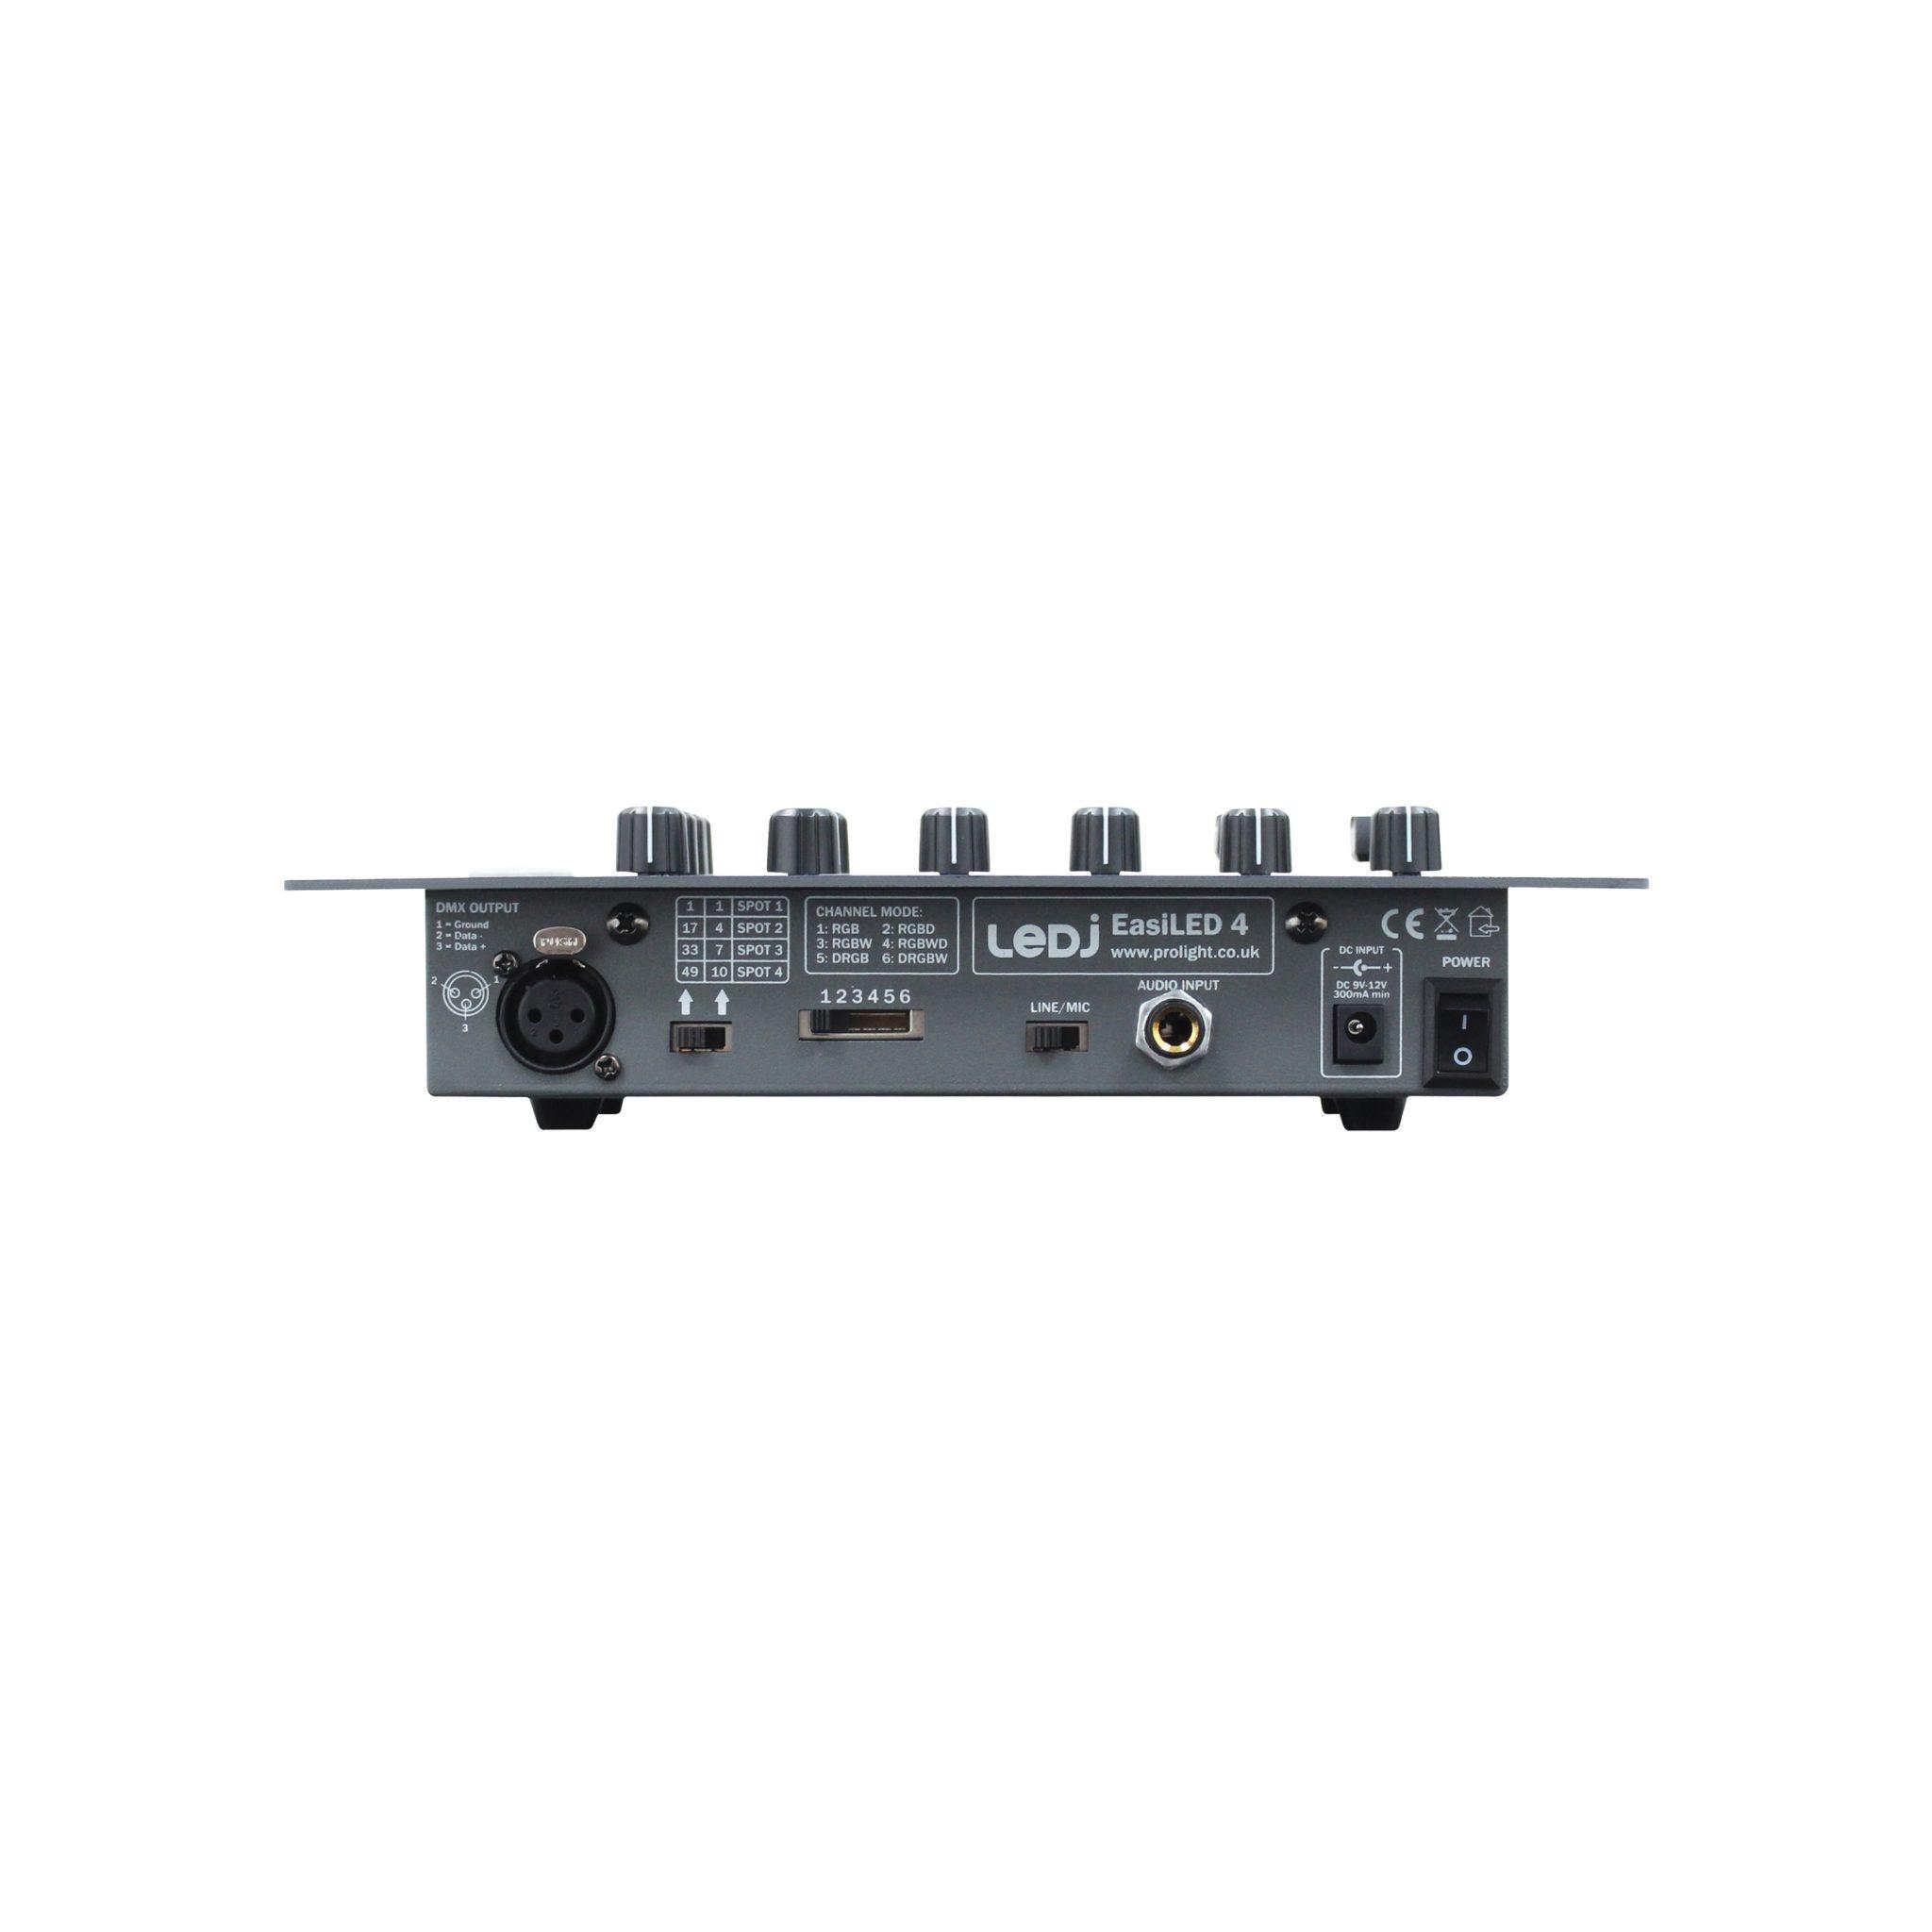 EasiLED 4 DMX controller